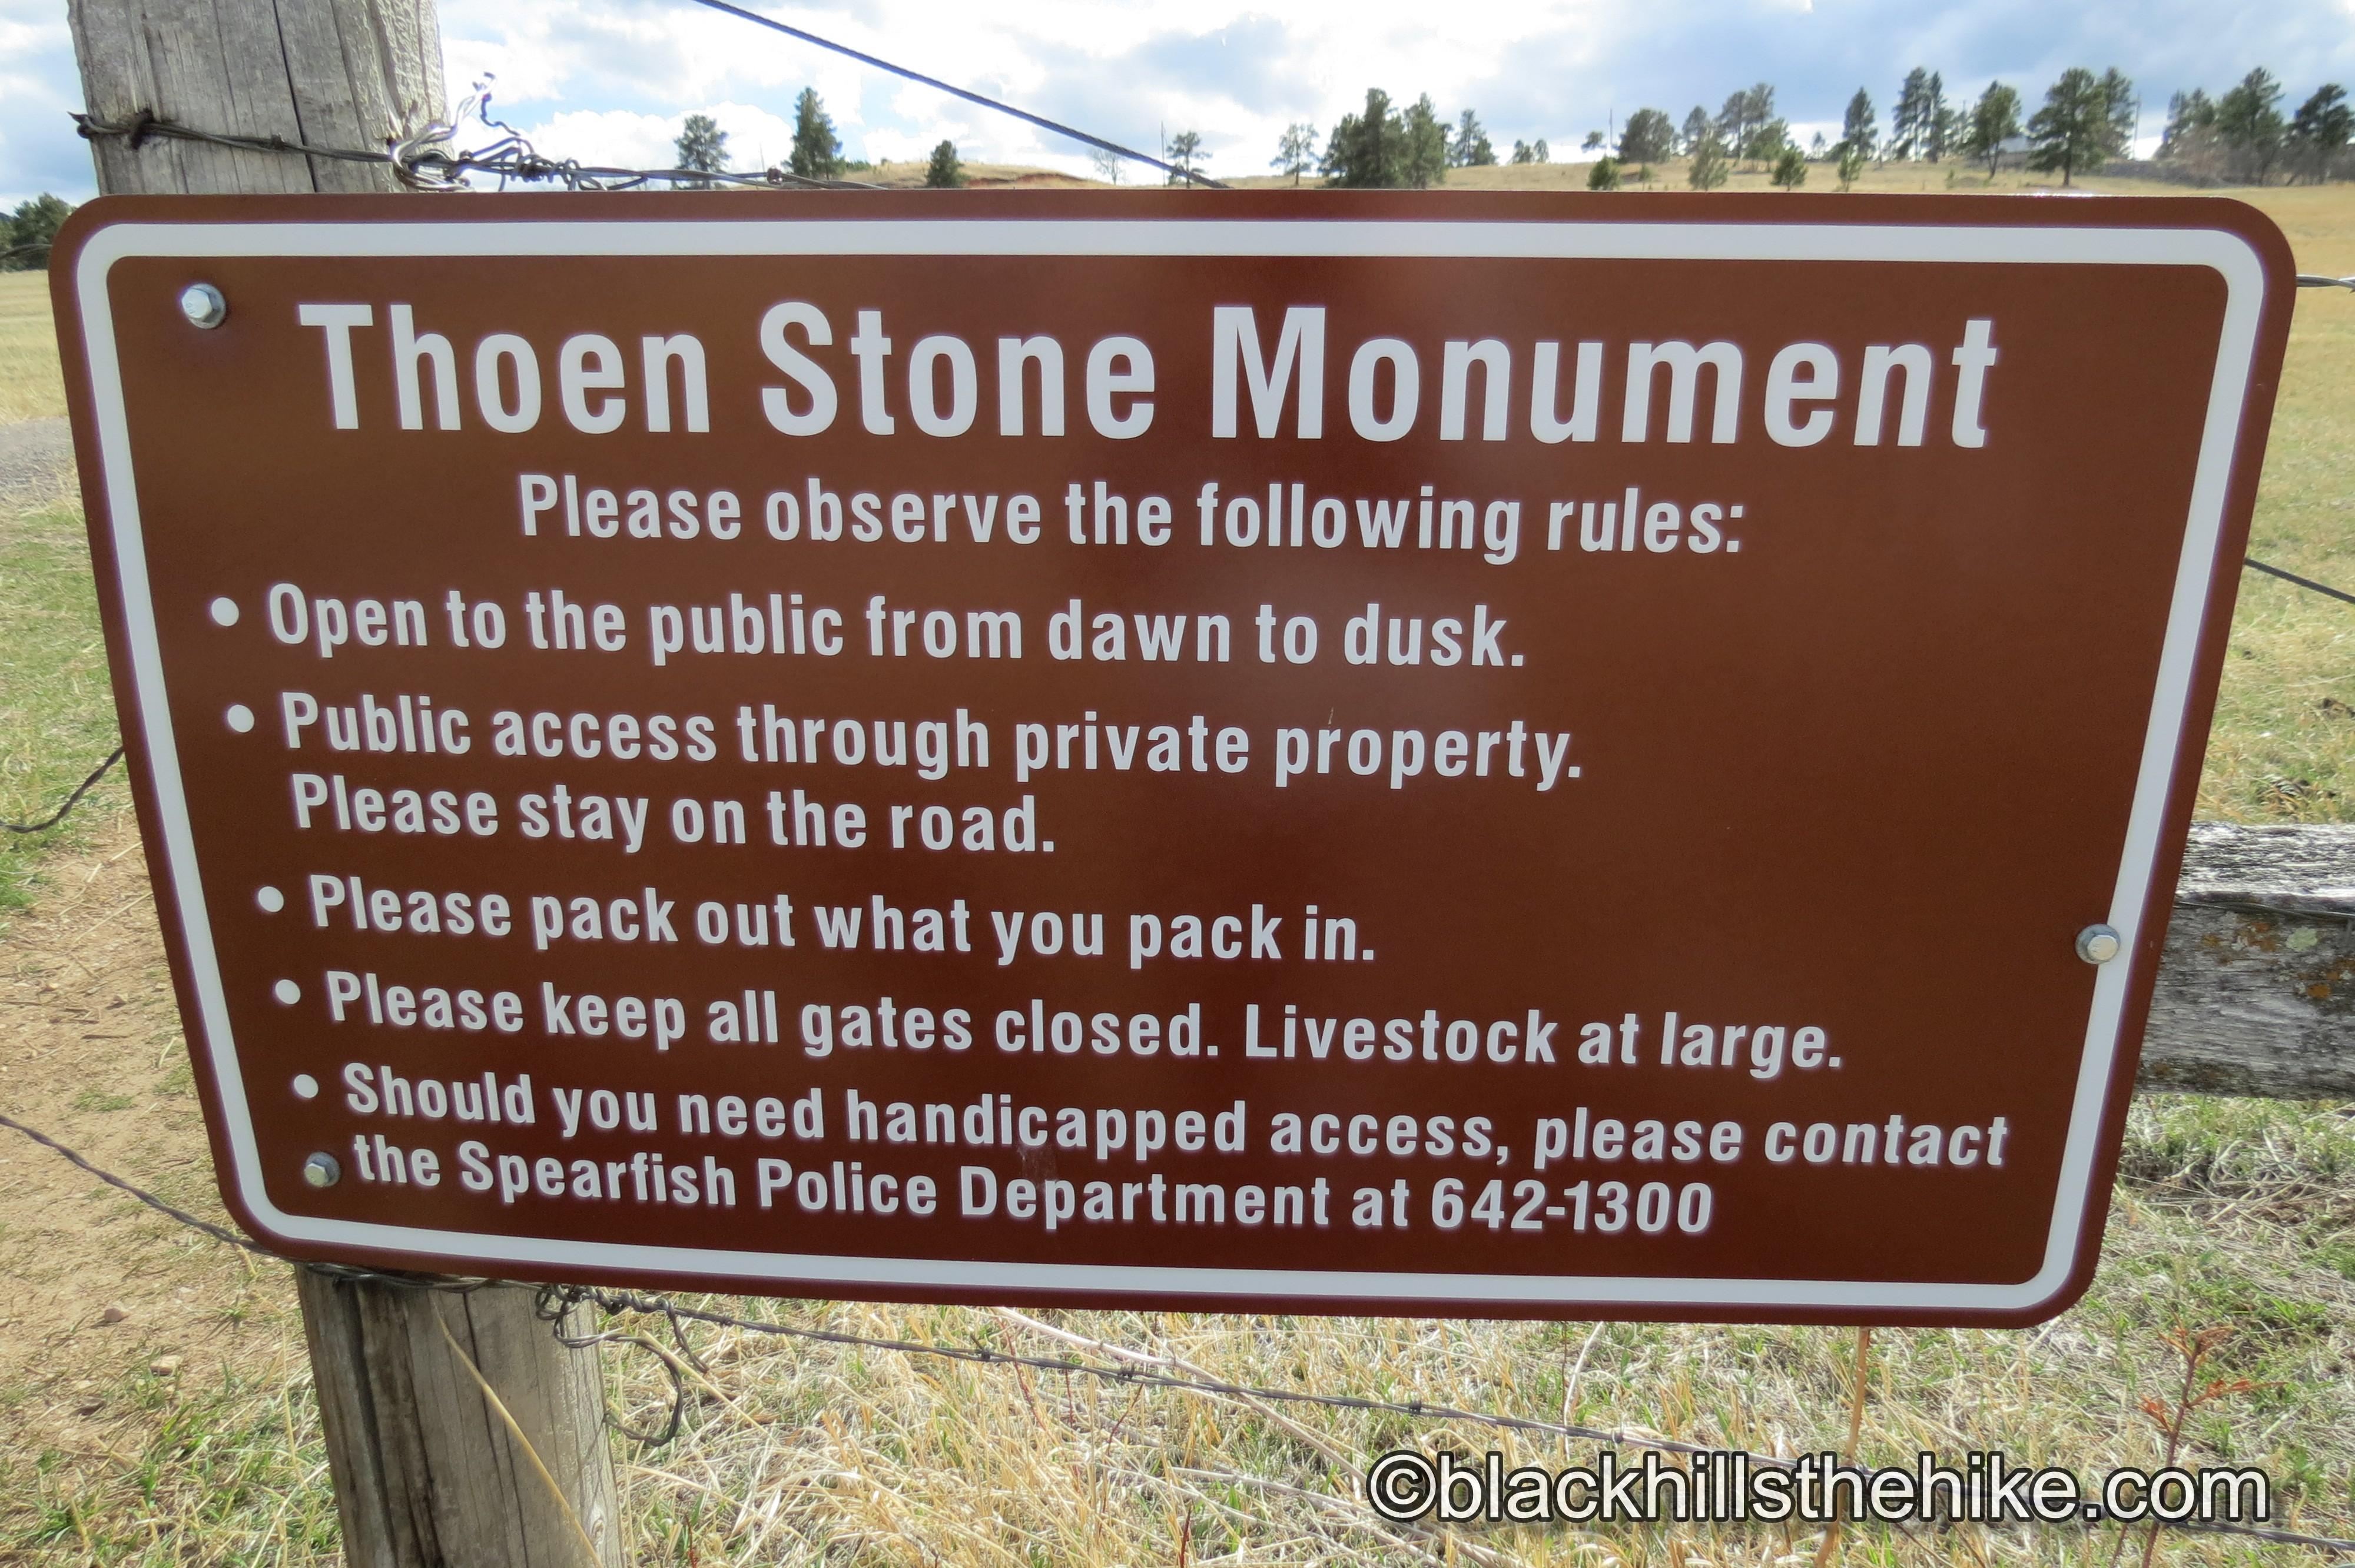 Thoen Stone